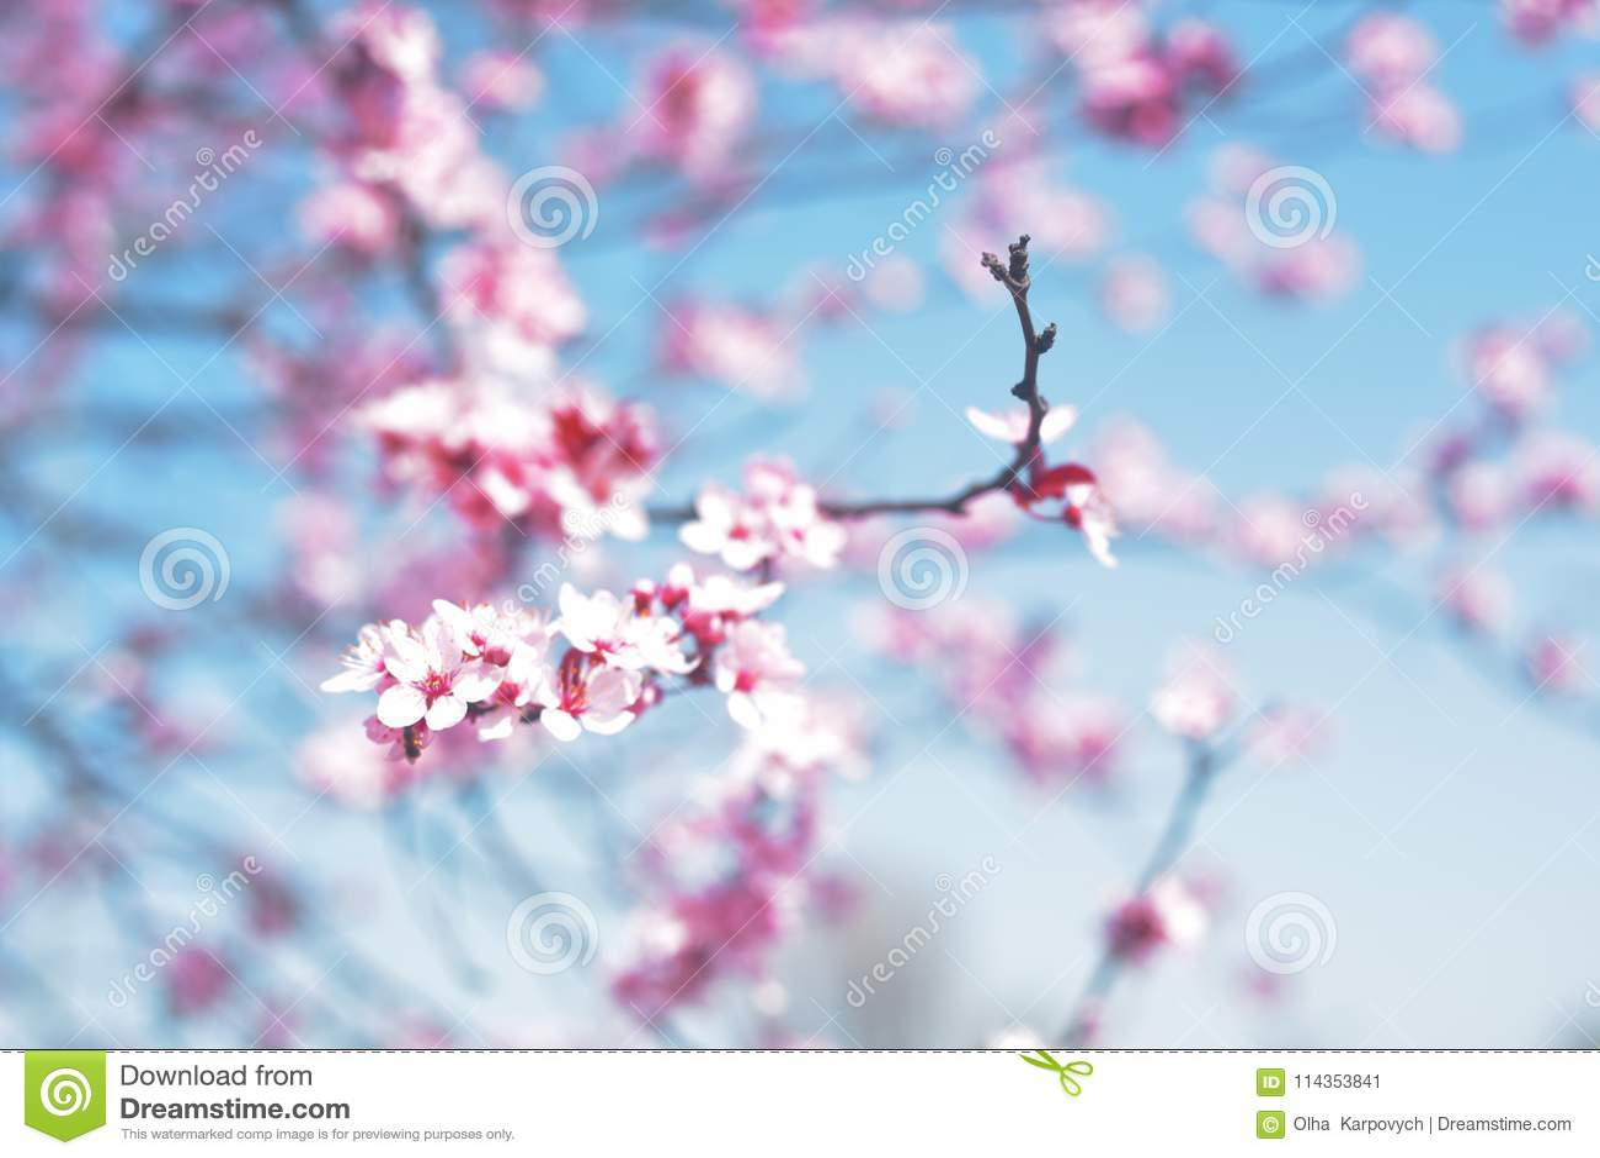 Pink Spring Flowers Blue Sky Springtime Spring Blossom Background